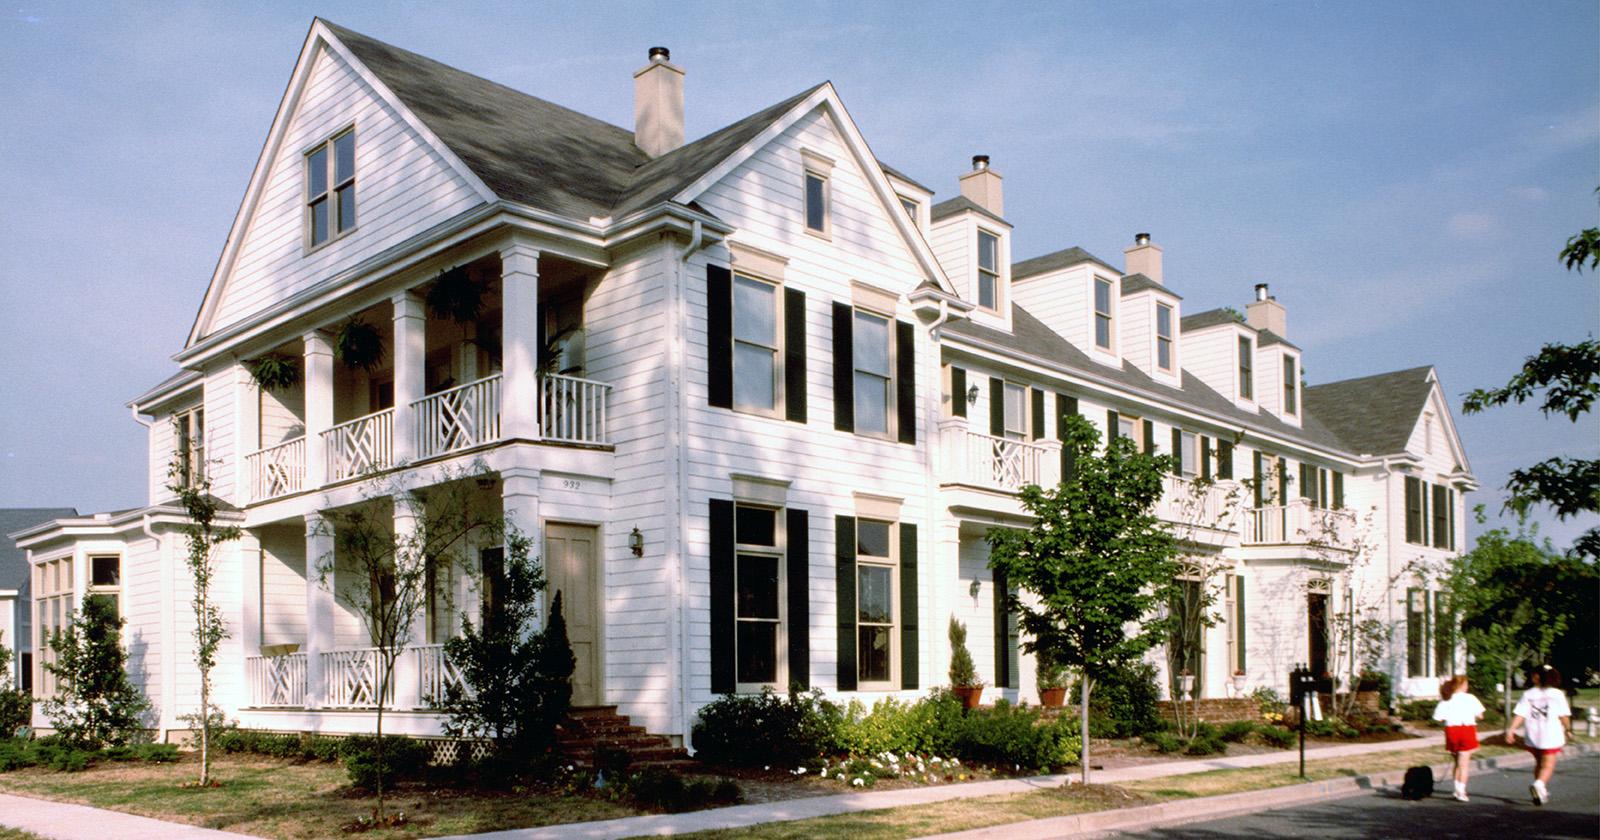 Harbor Town Townhomes, Memphis, TN